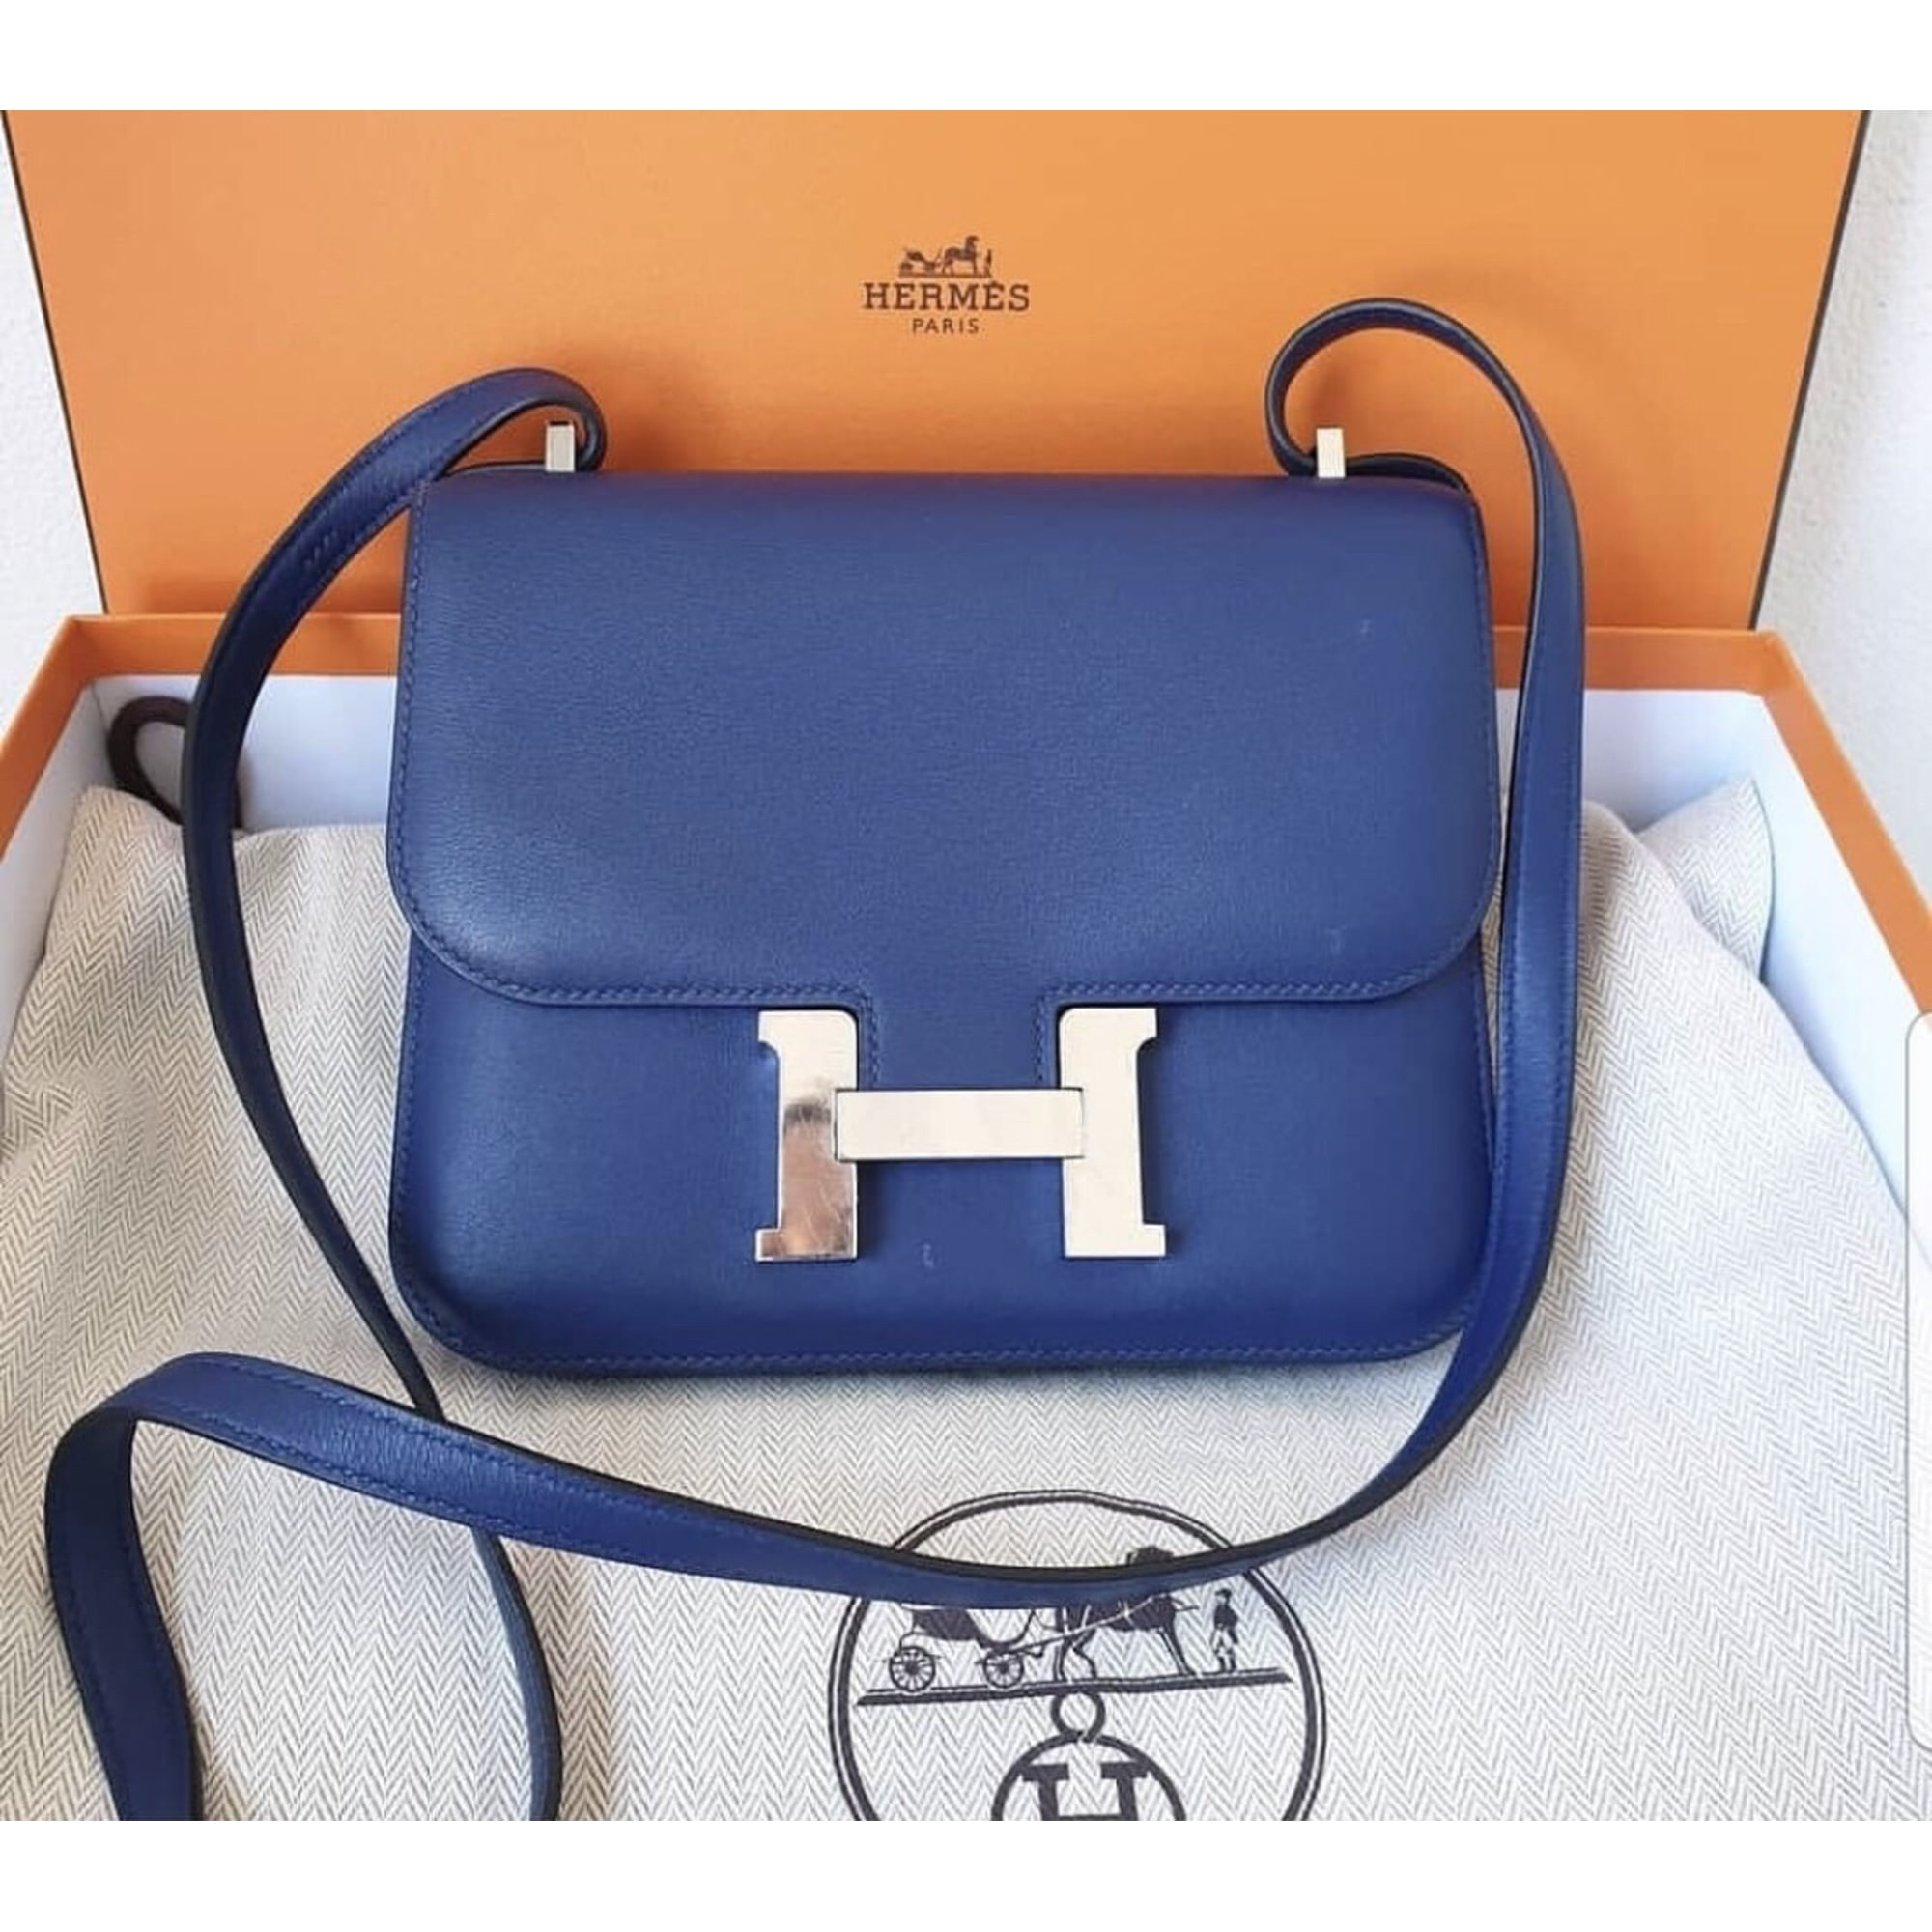 Sac à main en cuir HERMÈS Constance Bleu, bleu marine, bleu turquoise